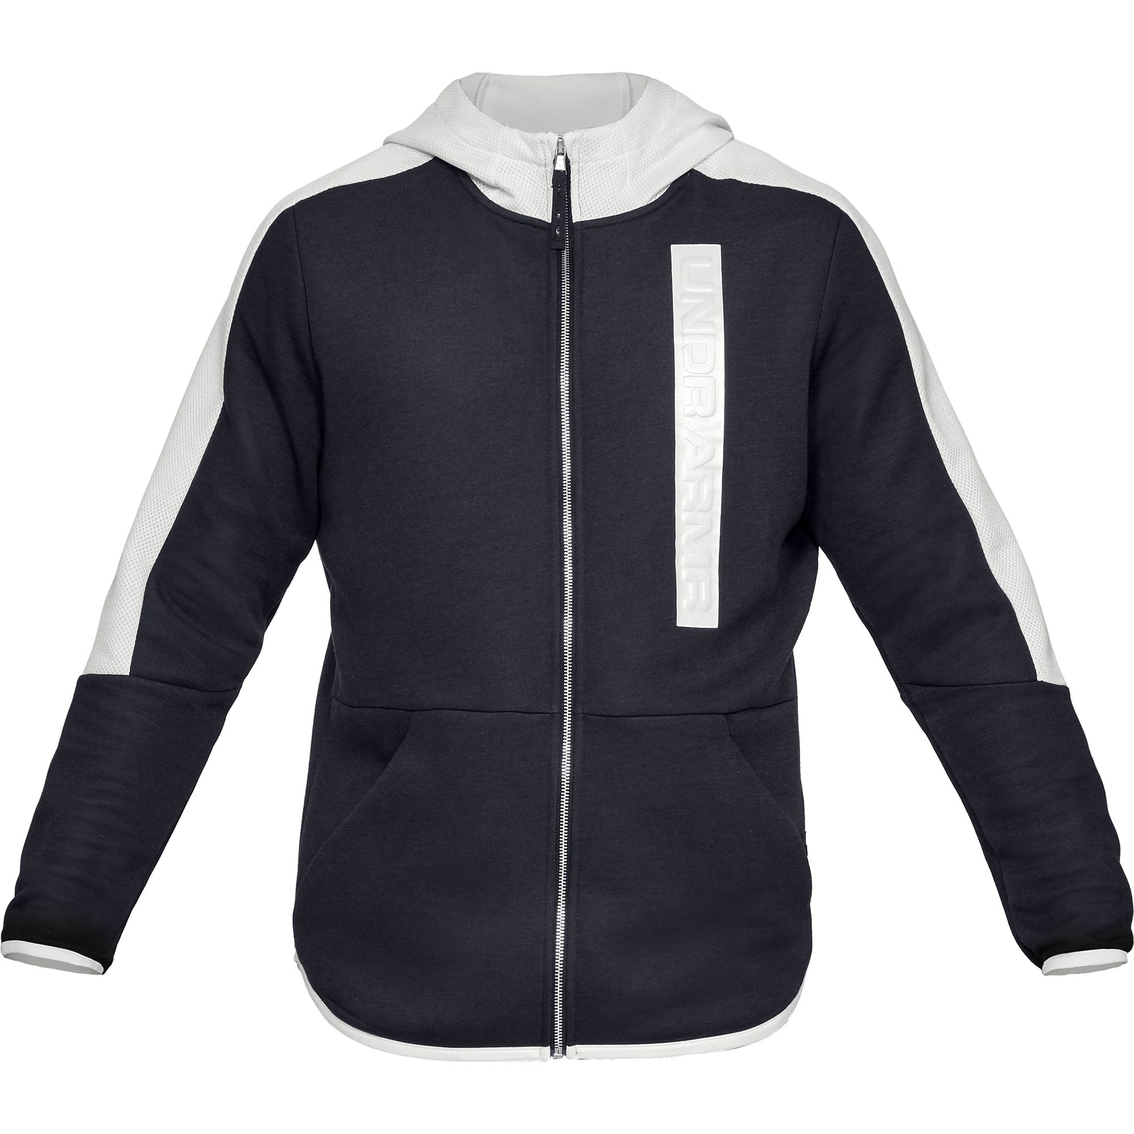 f1cd29e28 Under Armour Pursuit Versa Full Zip Hoodie | Sweatshirts & Hoodies ...